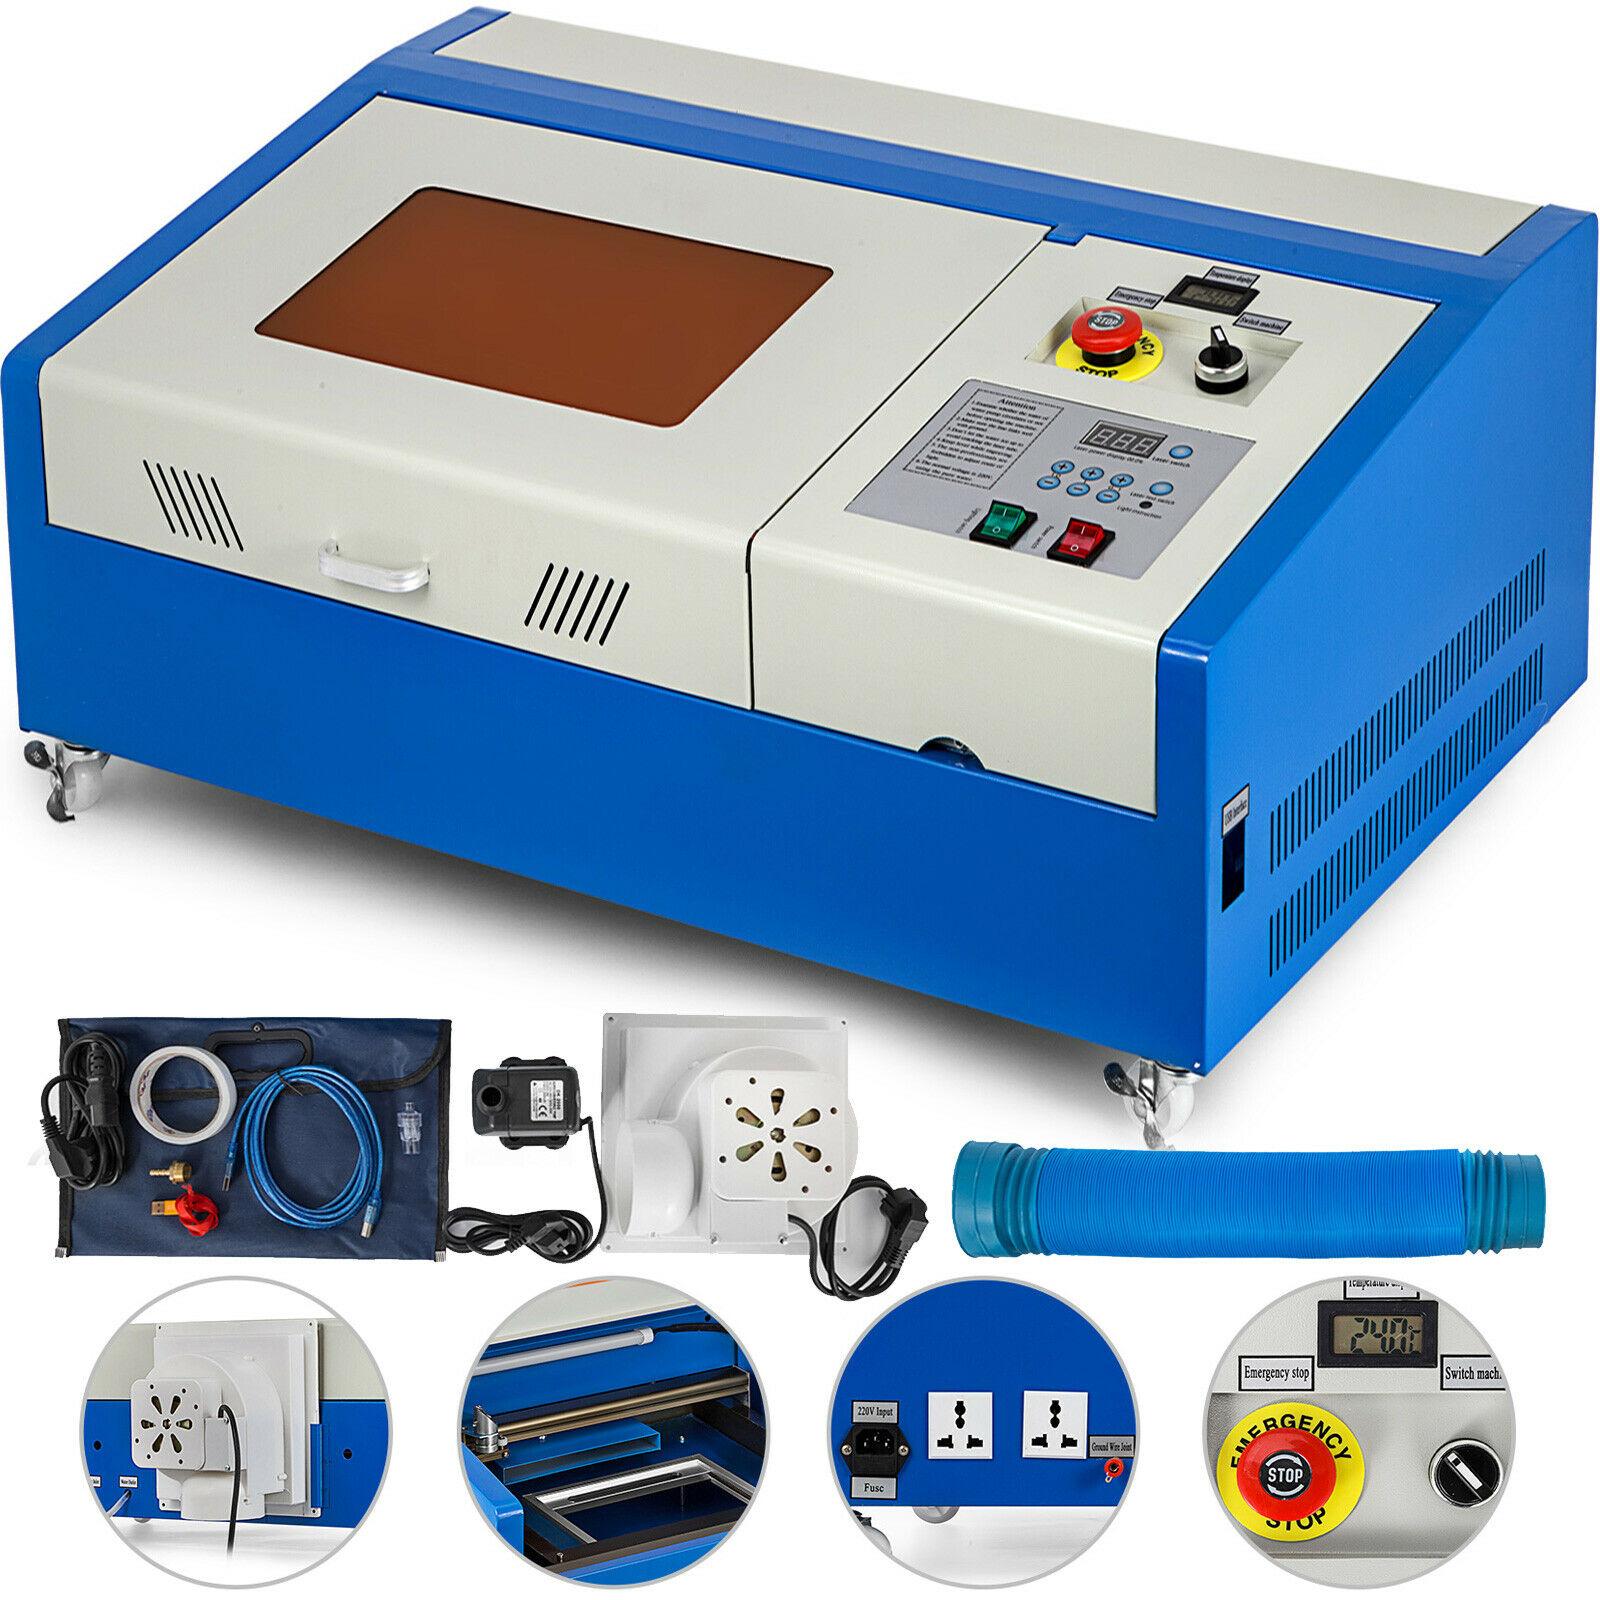 Poland Warehouse 40W CO2 USB Laser Engraving Cutting Machine Engraver Wood Cutter